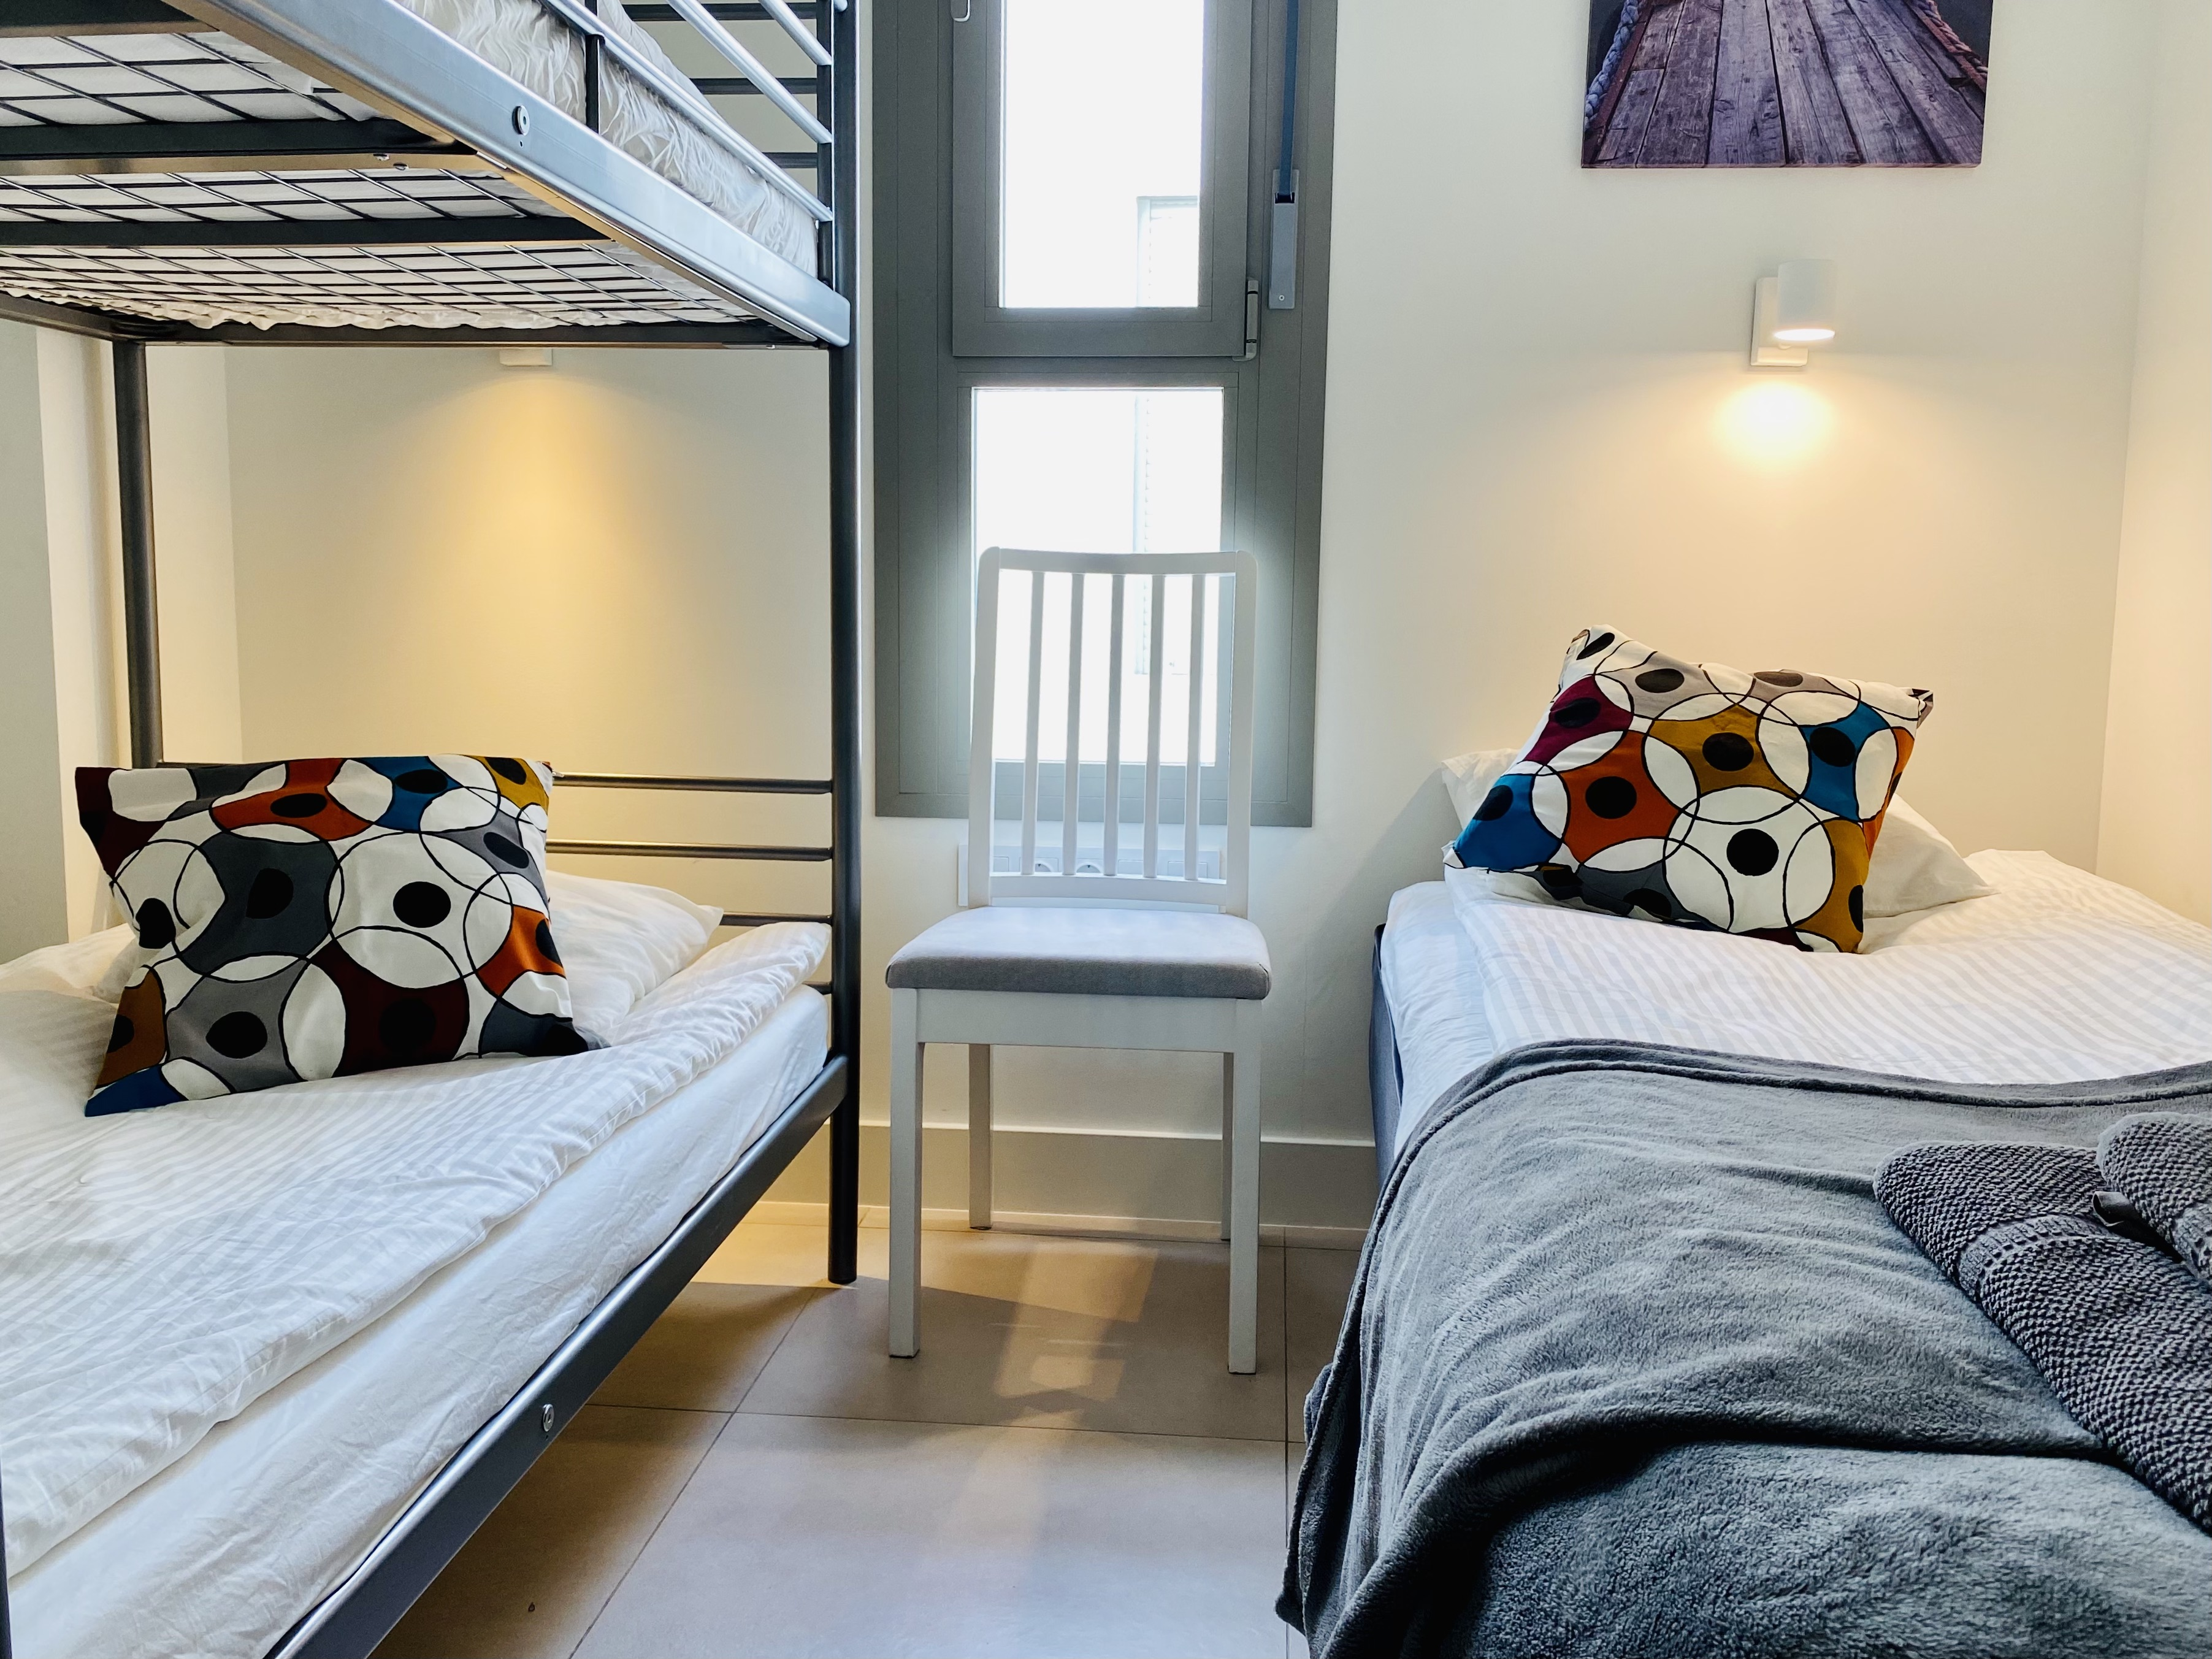 Lilla sovrum 2